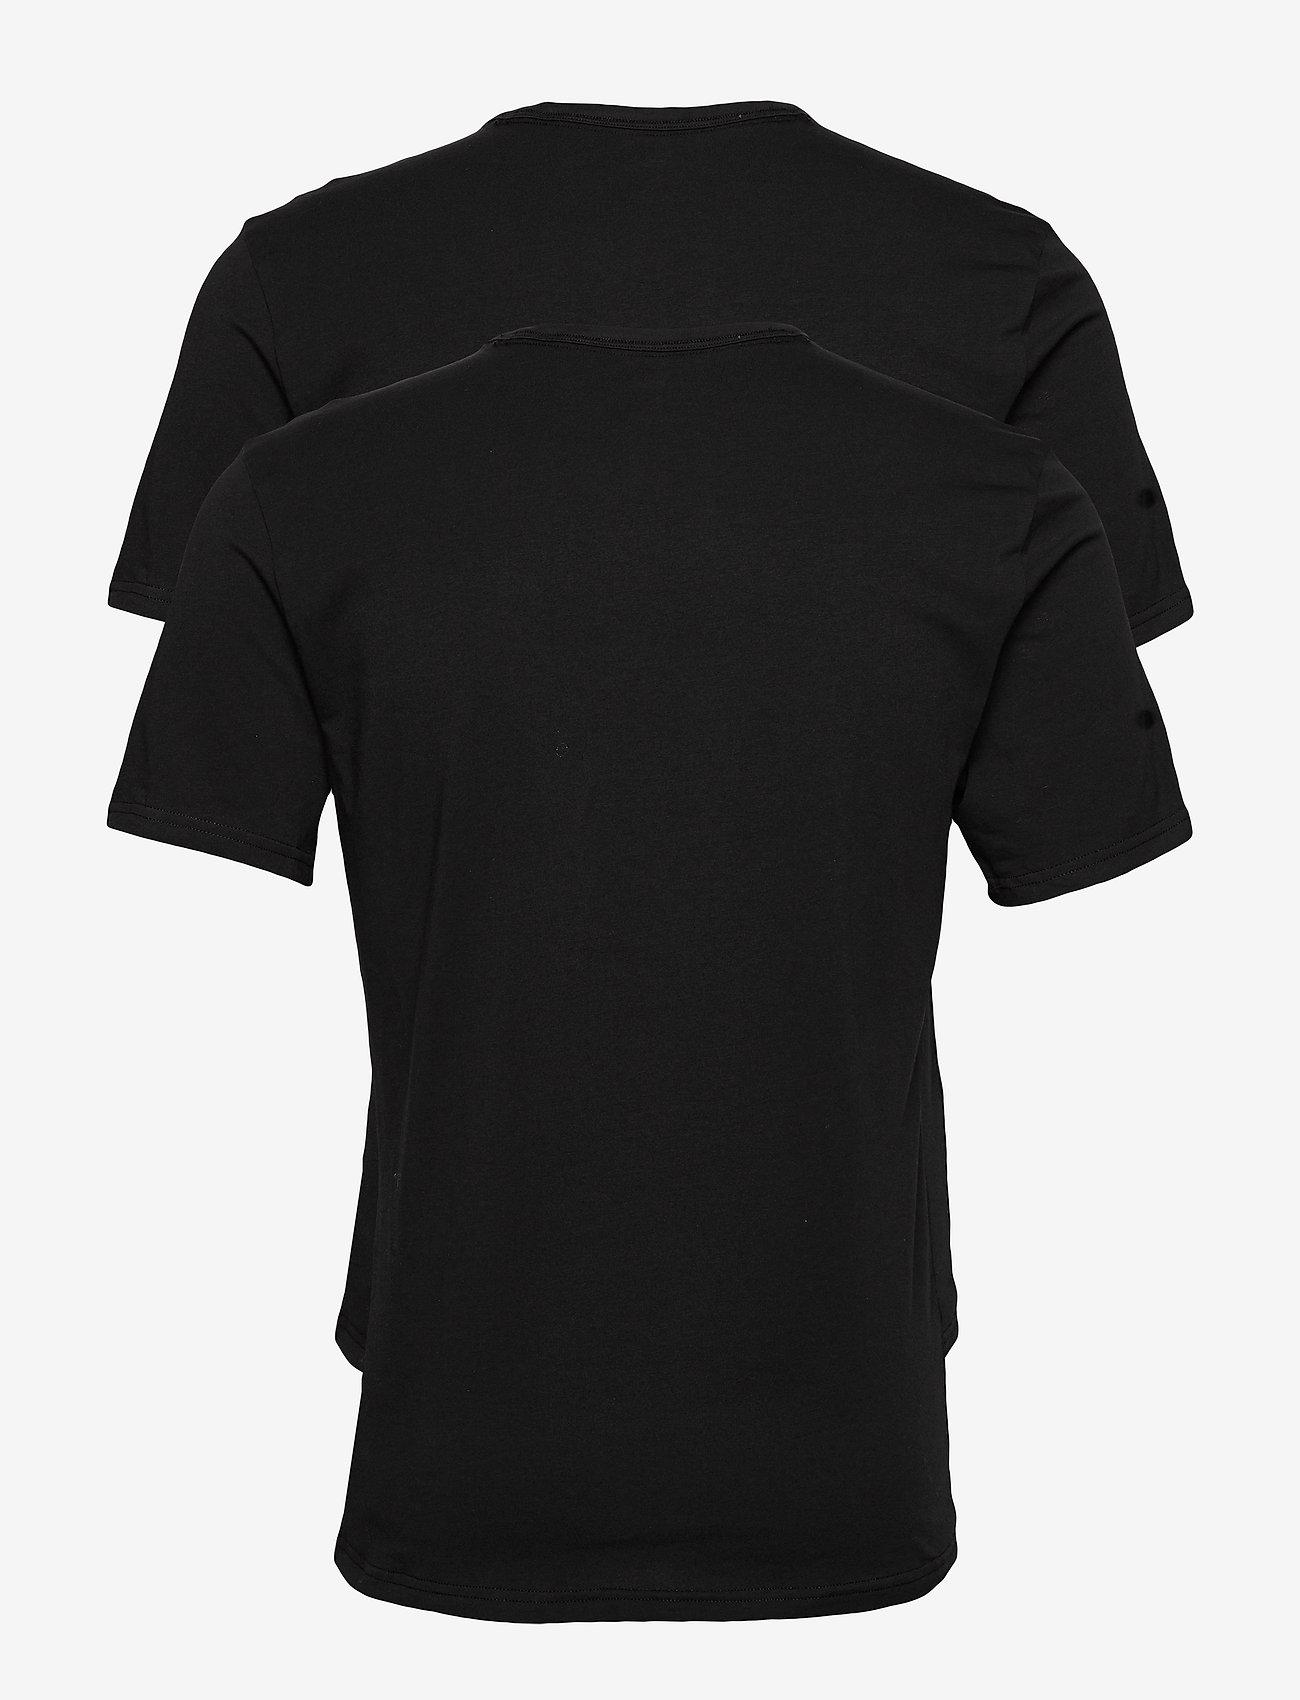 Calvin Klein - S/S CREW NECK 2PK - multipack - black - 1